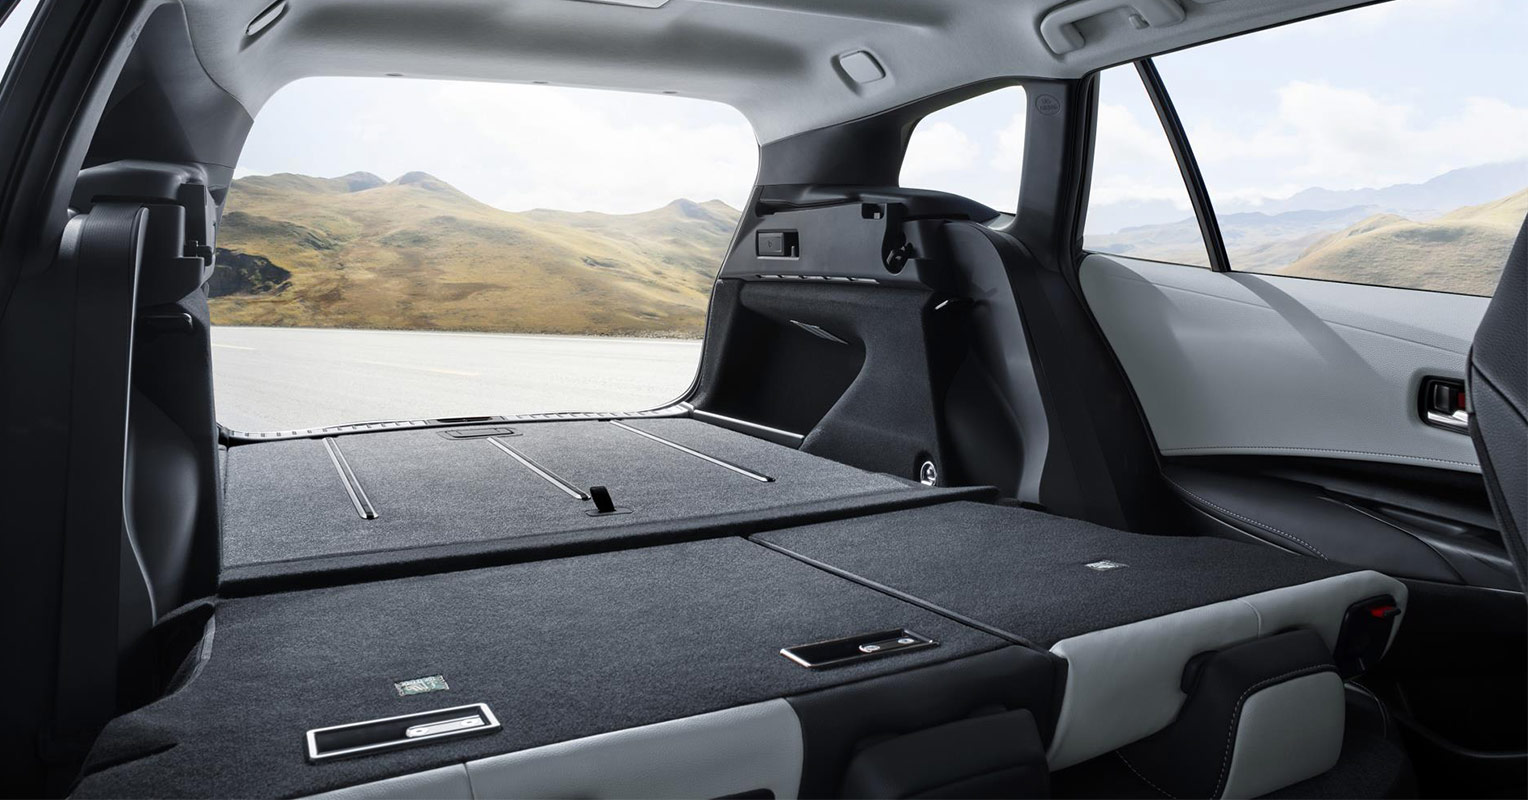 Maletero del Toyota Corolla Hybrid Touring Sports